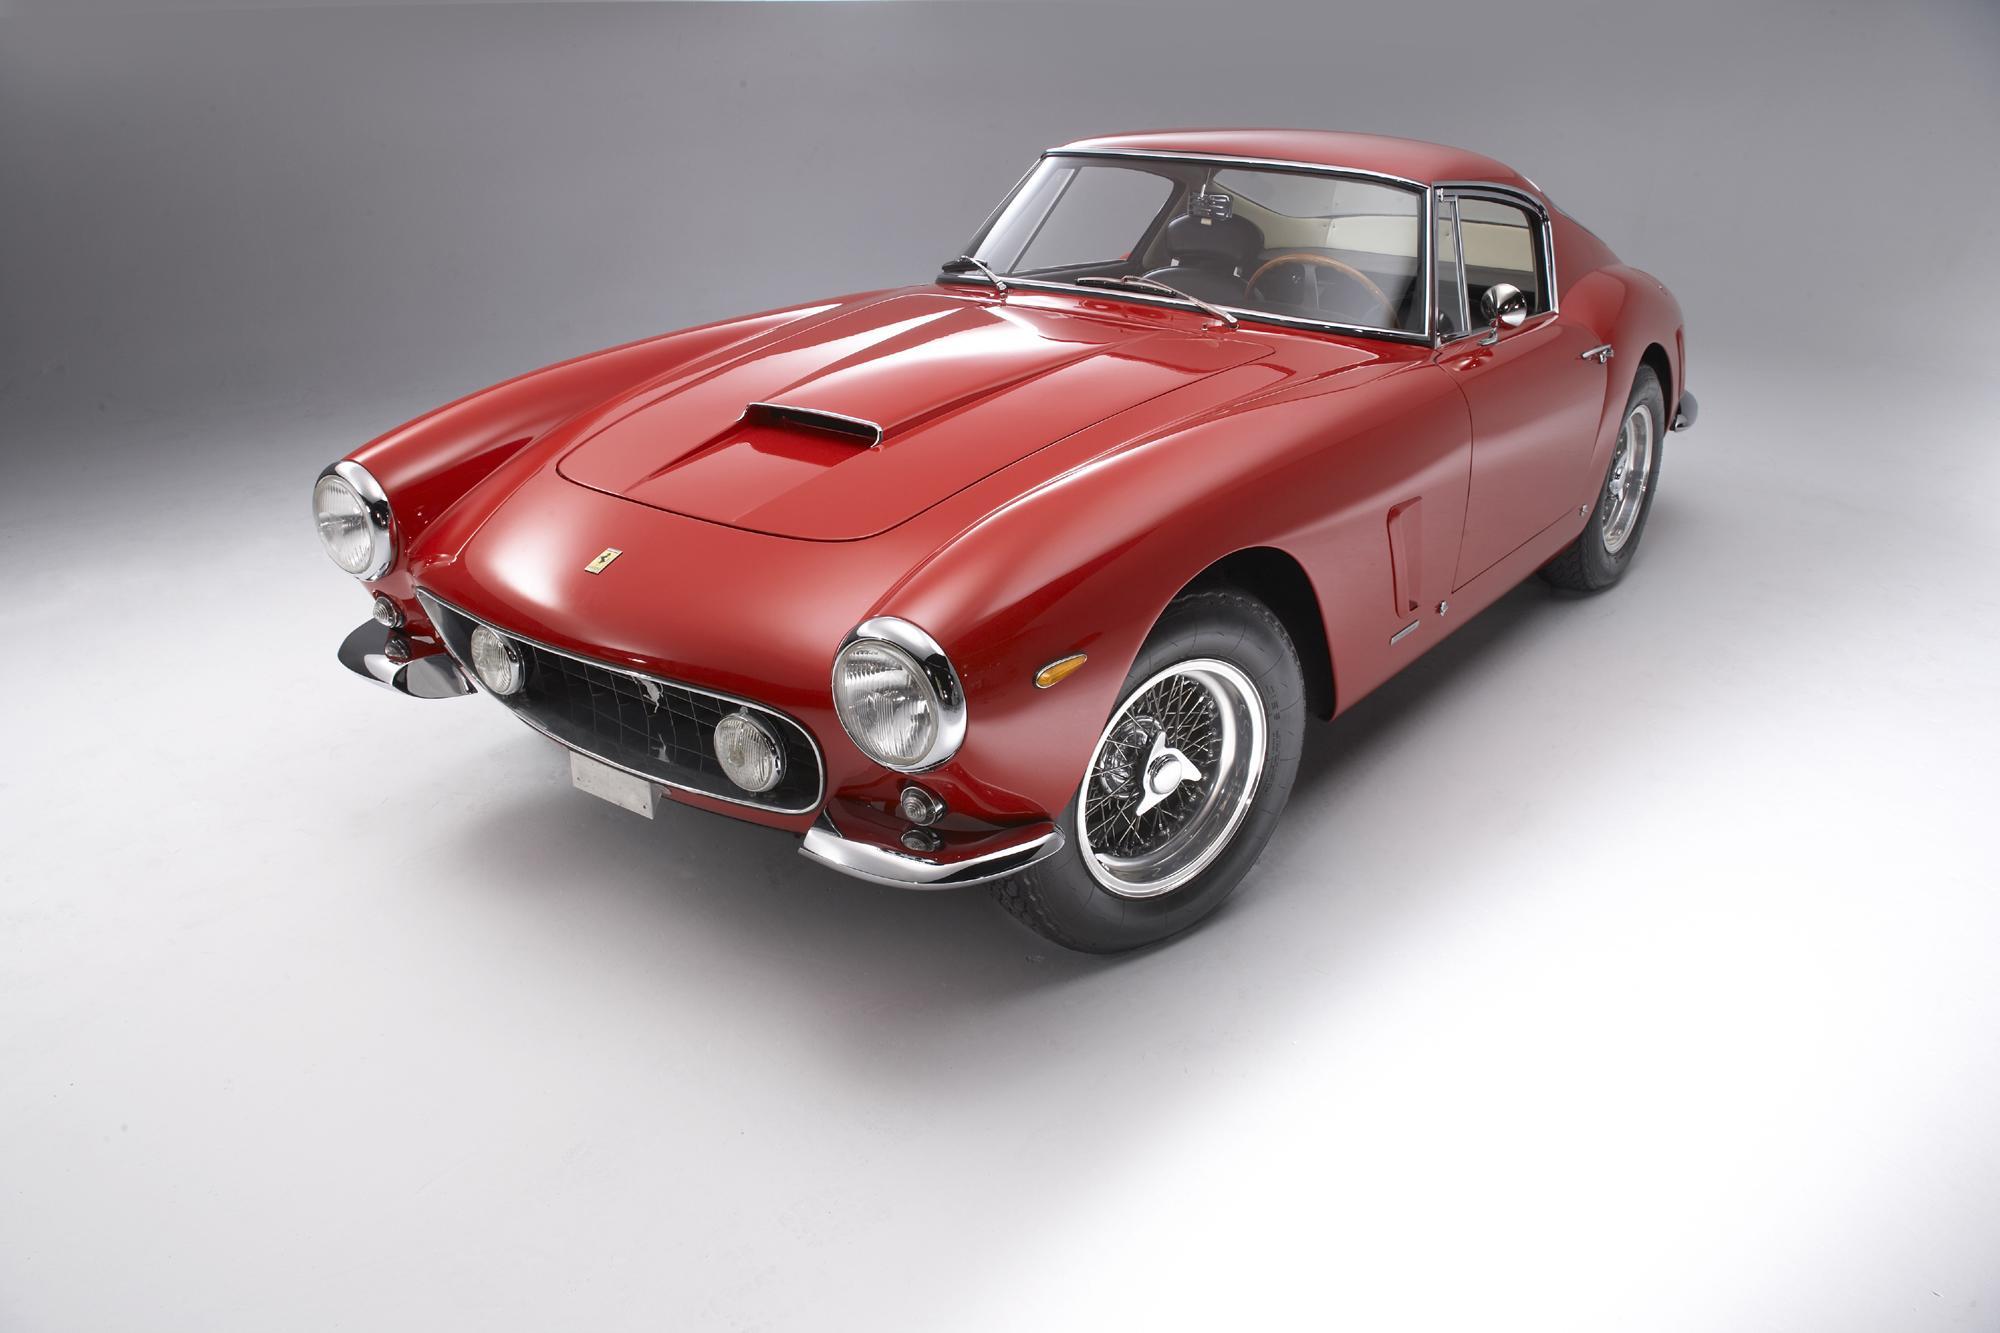 $4.5 Million Ferrari Leads Classic Car Auction | Scoop News